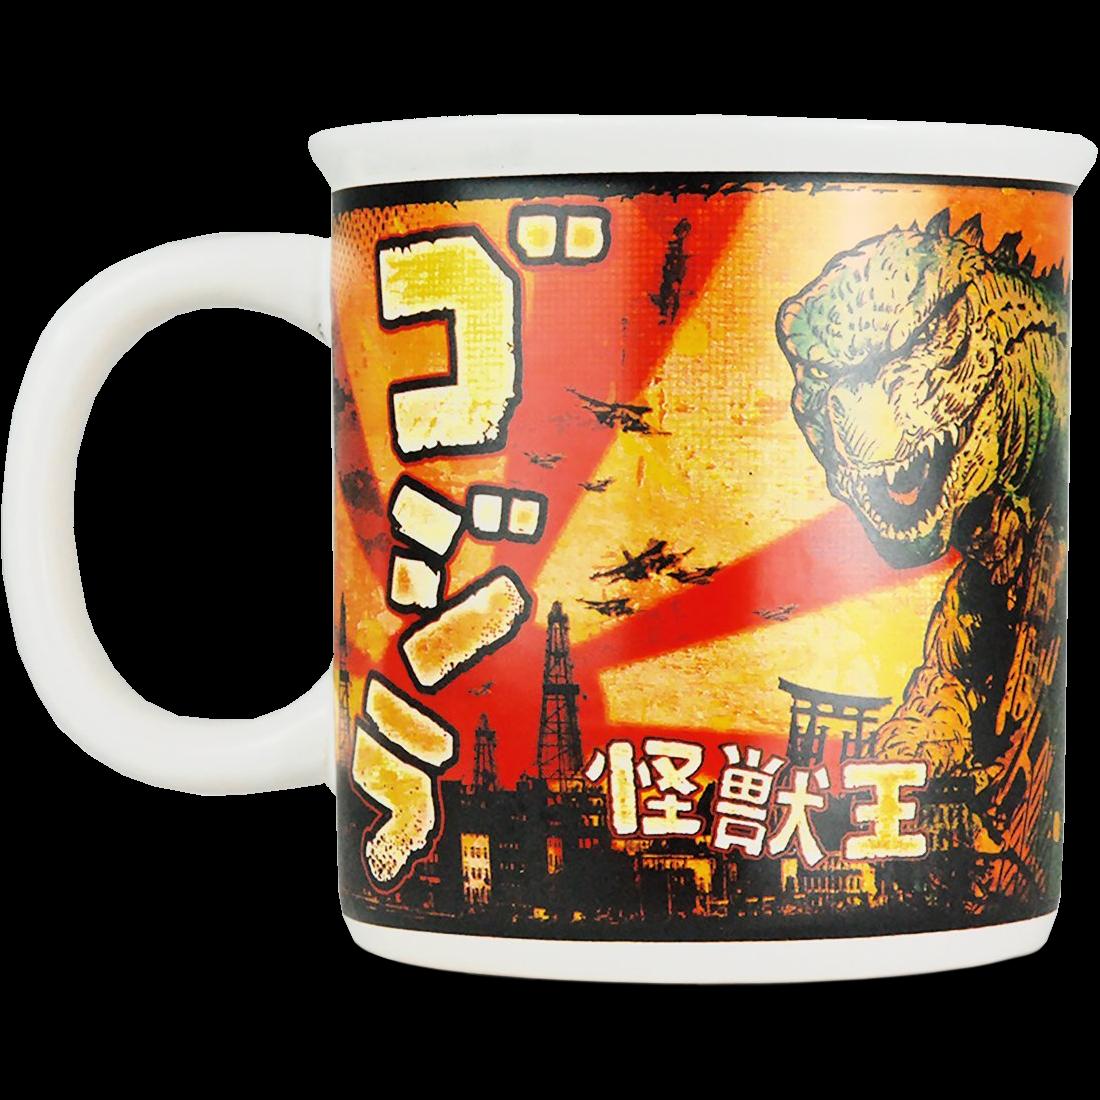 Godzilla Giant Monster Mug